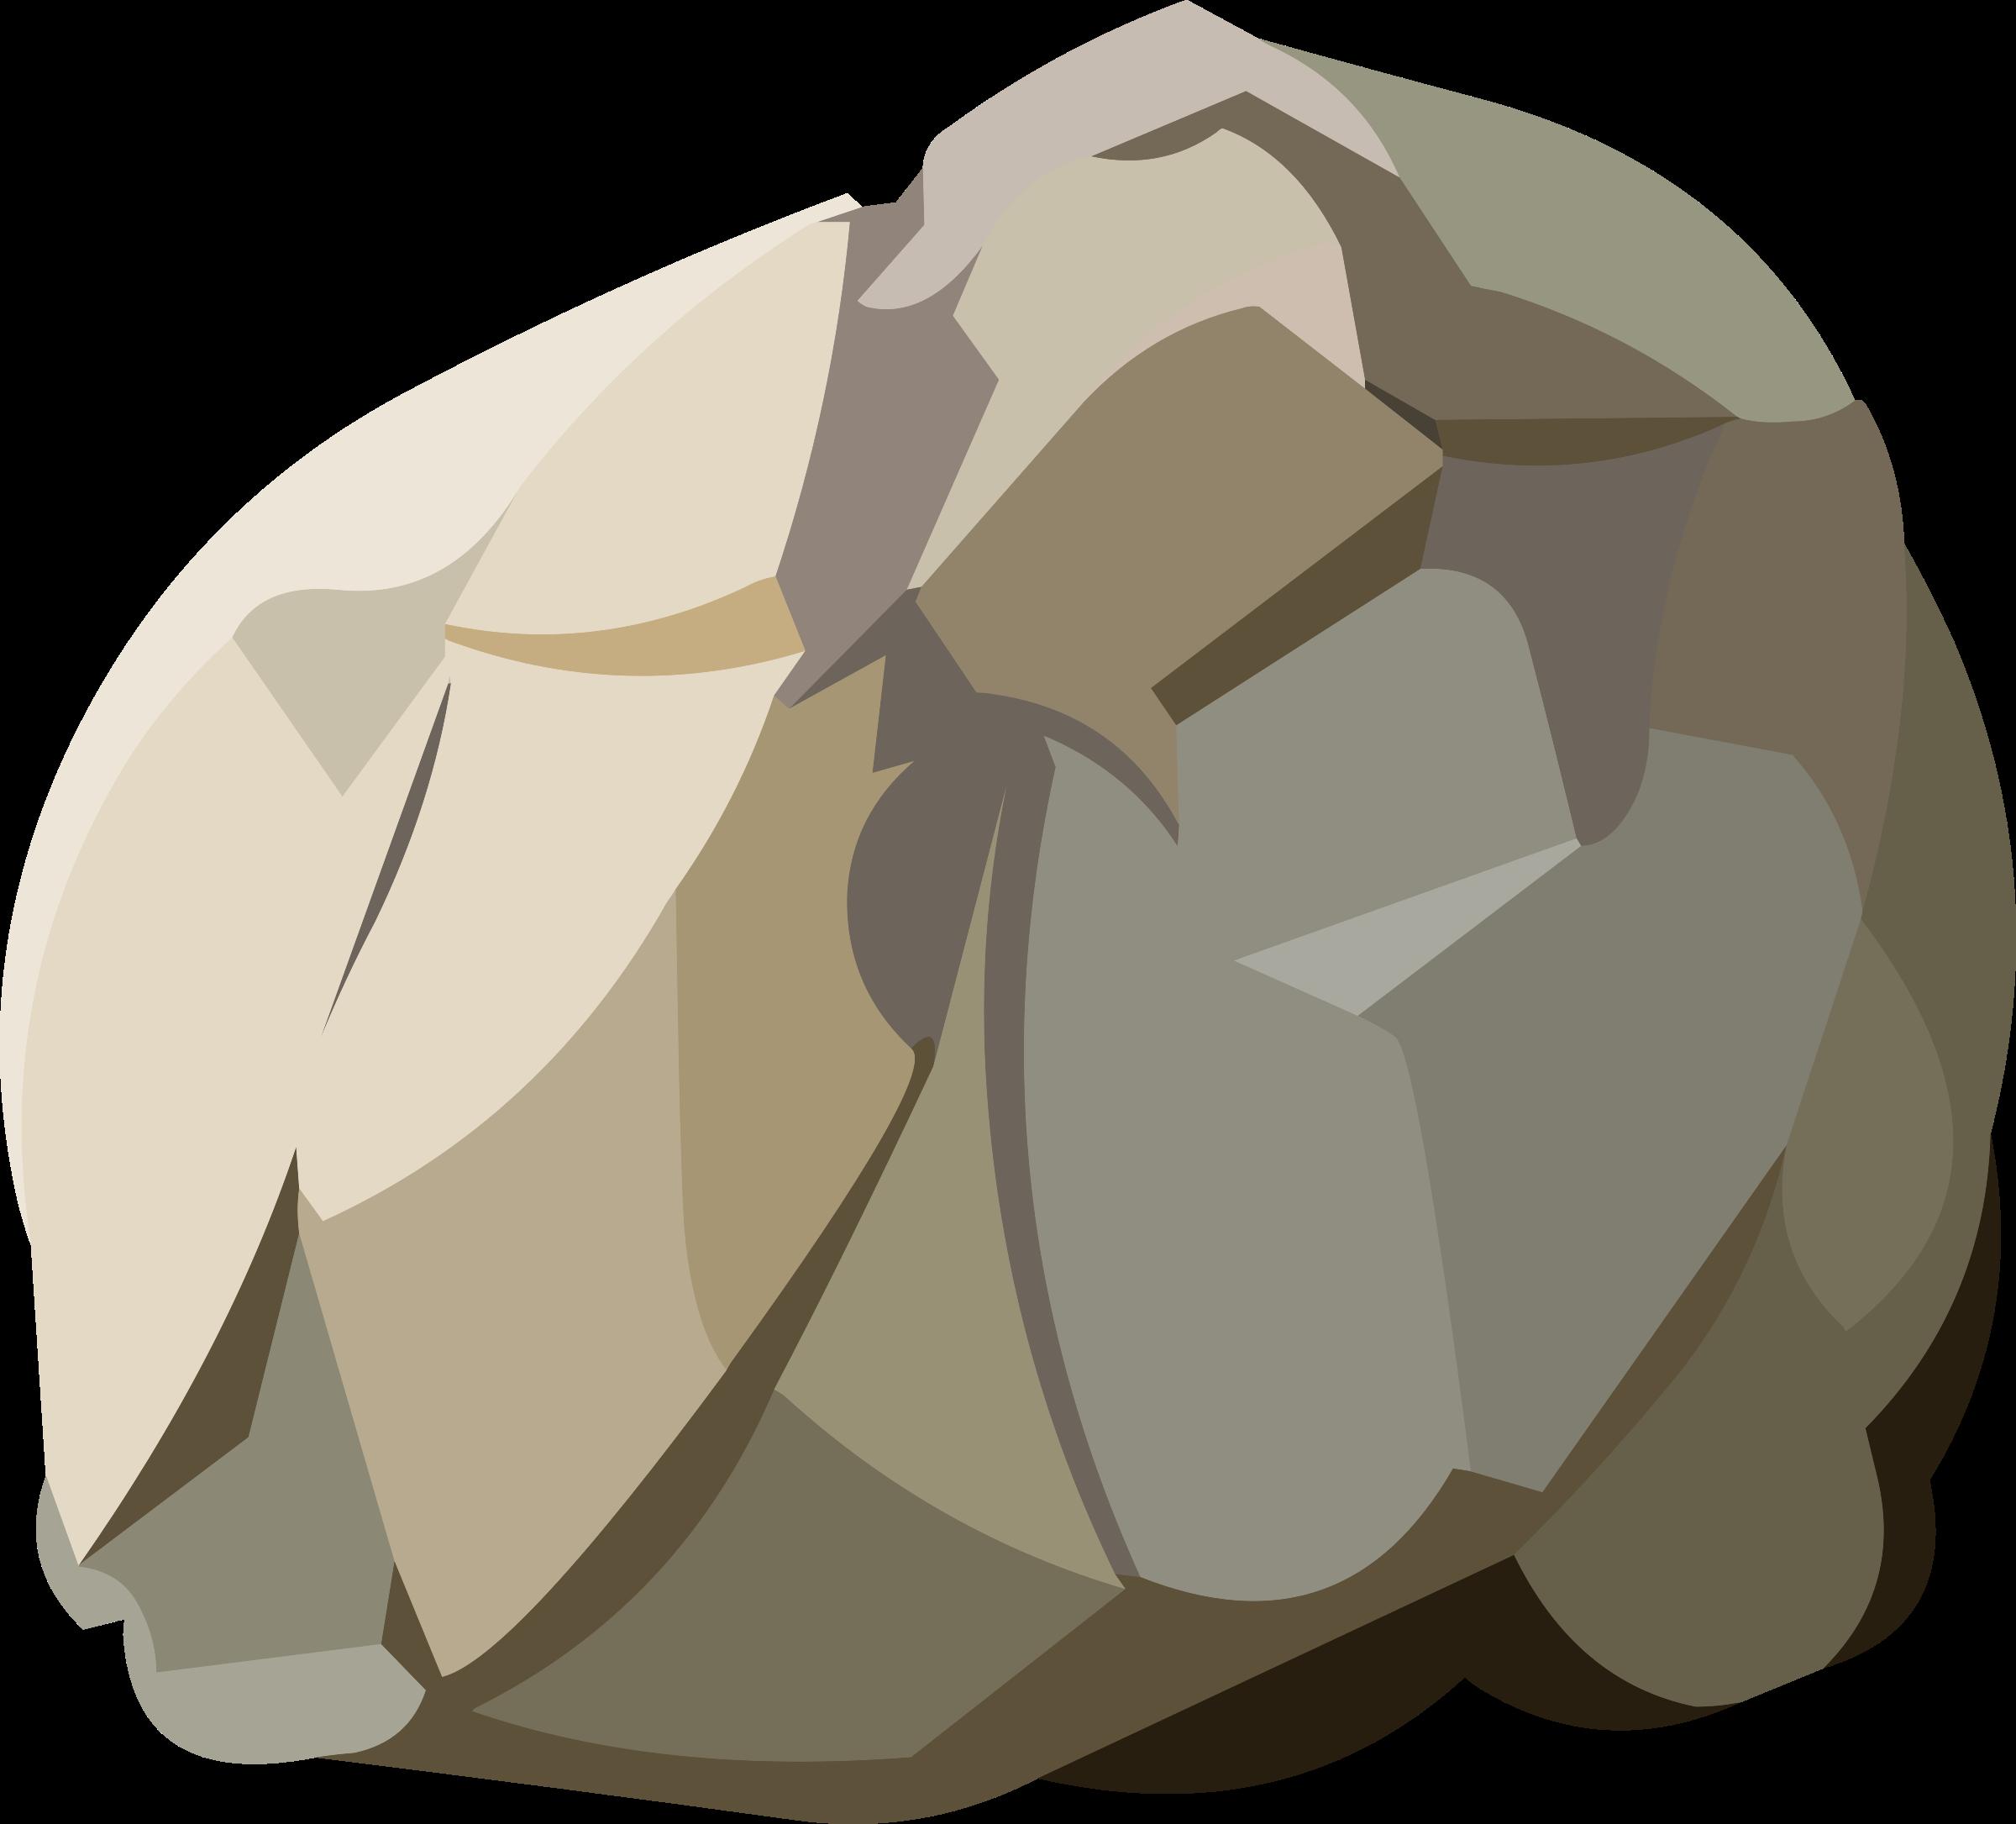 Rock clip art free clipart images 2